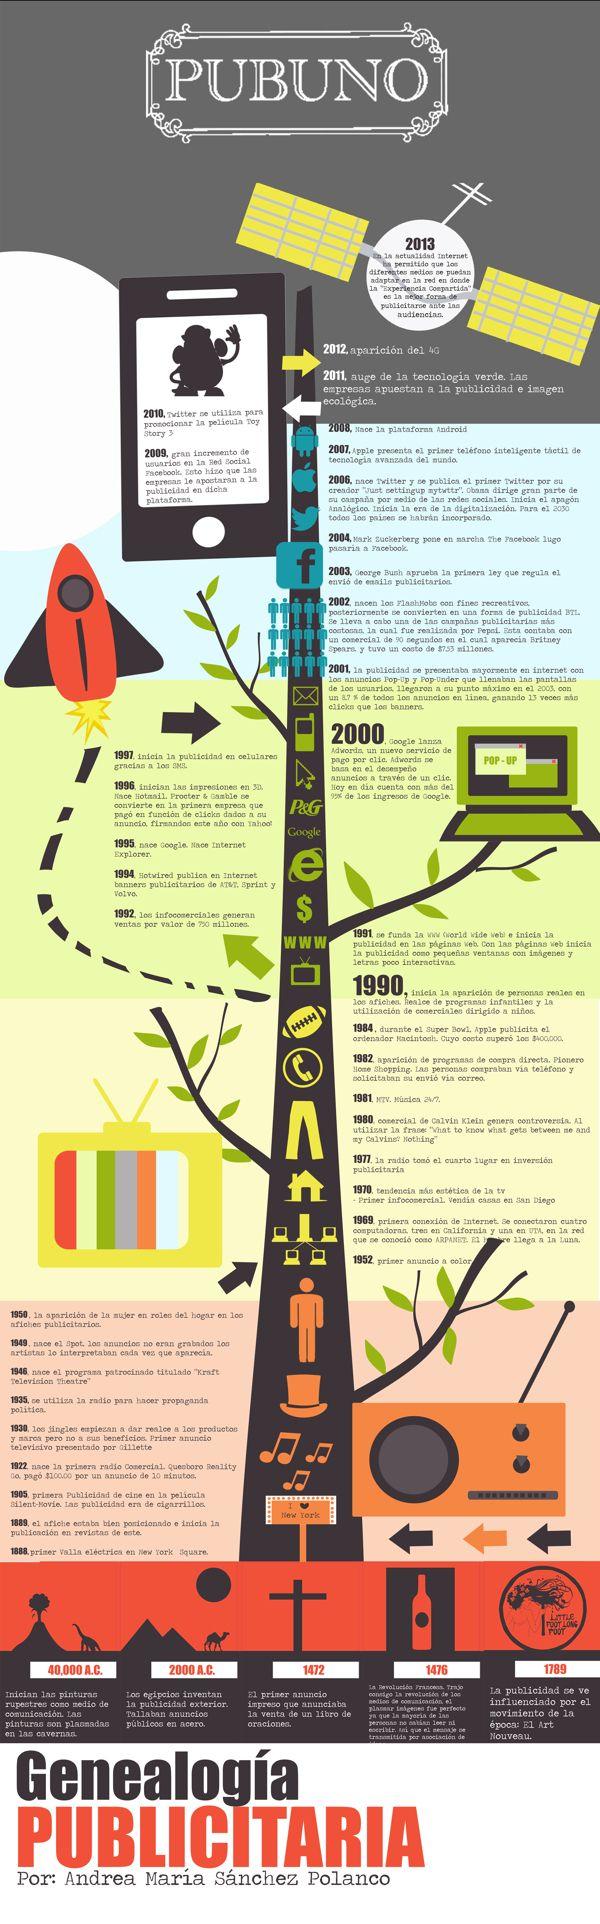 Genealogía publicitaria #infografia